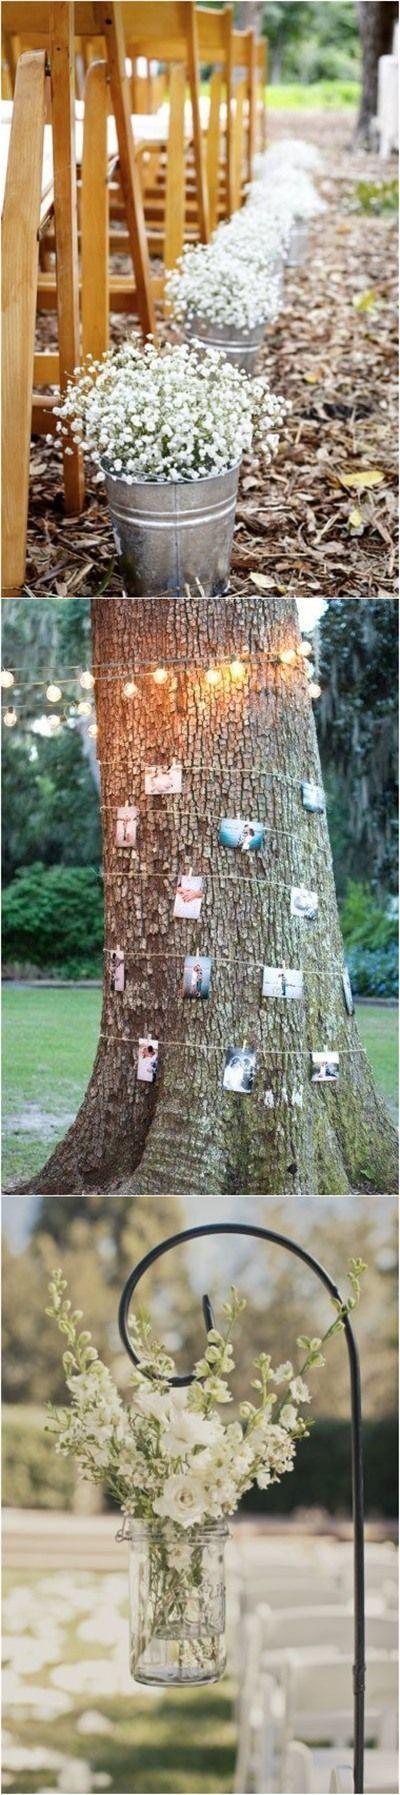 Rustic Weddings » 20+ Genius Outdoor Wedding Ideas » Outdoor wedding decorations